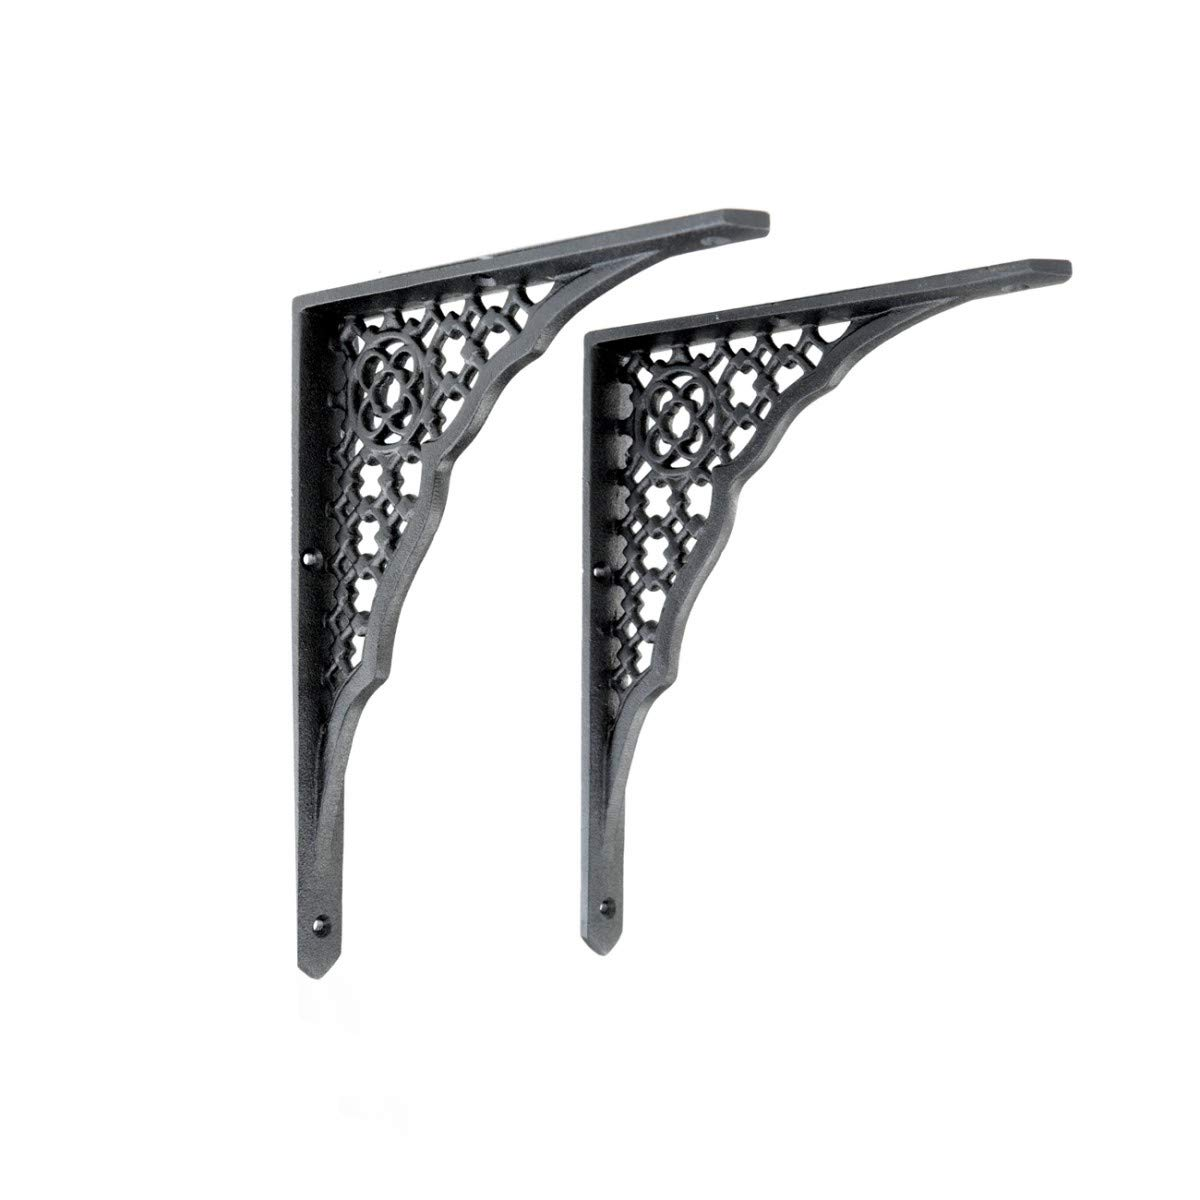 Ornate Black Aluminum Wall Shelf Bracket 8 3/4'' X 7'' Sturdy Traditional Victorian Design Sold As A PAIR